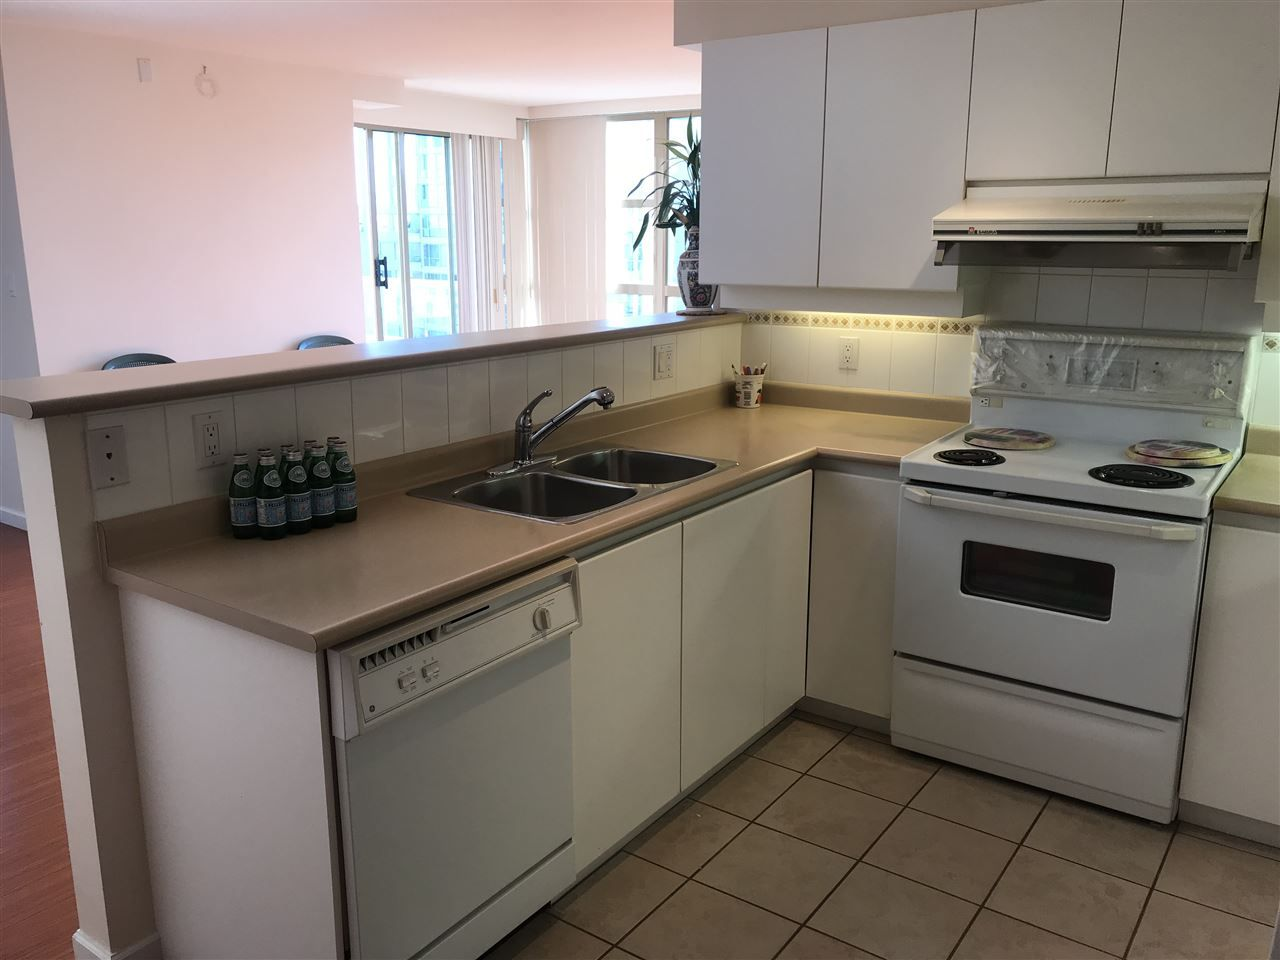 "Photo 12: Photos: 901 6119 COONEY Road in Richmond: Brighouse Condo for sale in ""ROSARIO GARDENS"" : MLS®# R2373184"